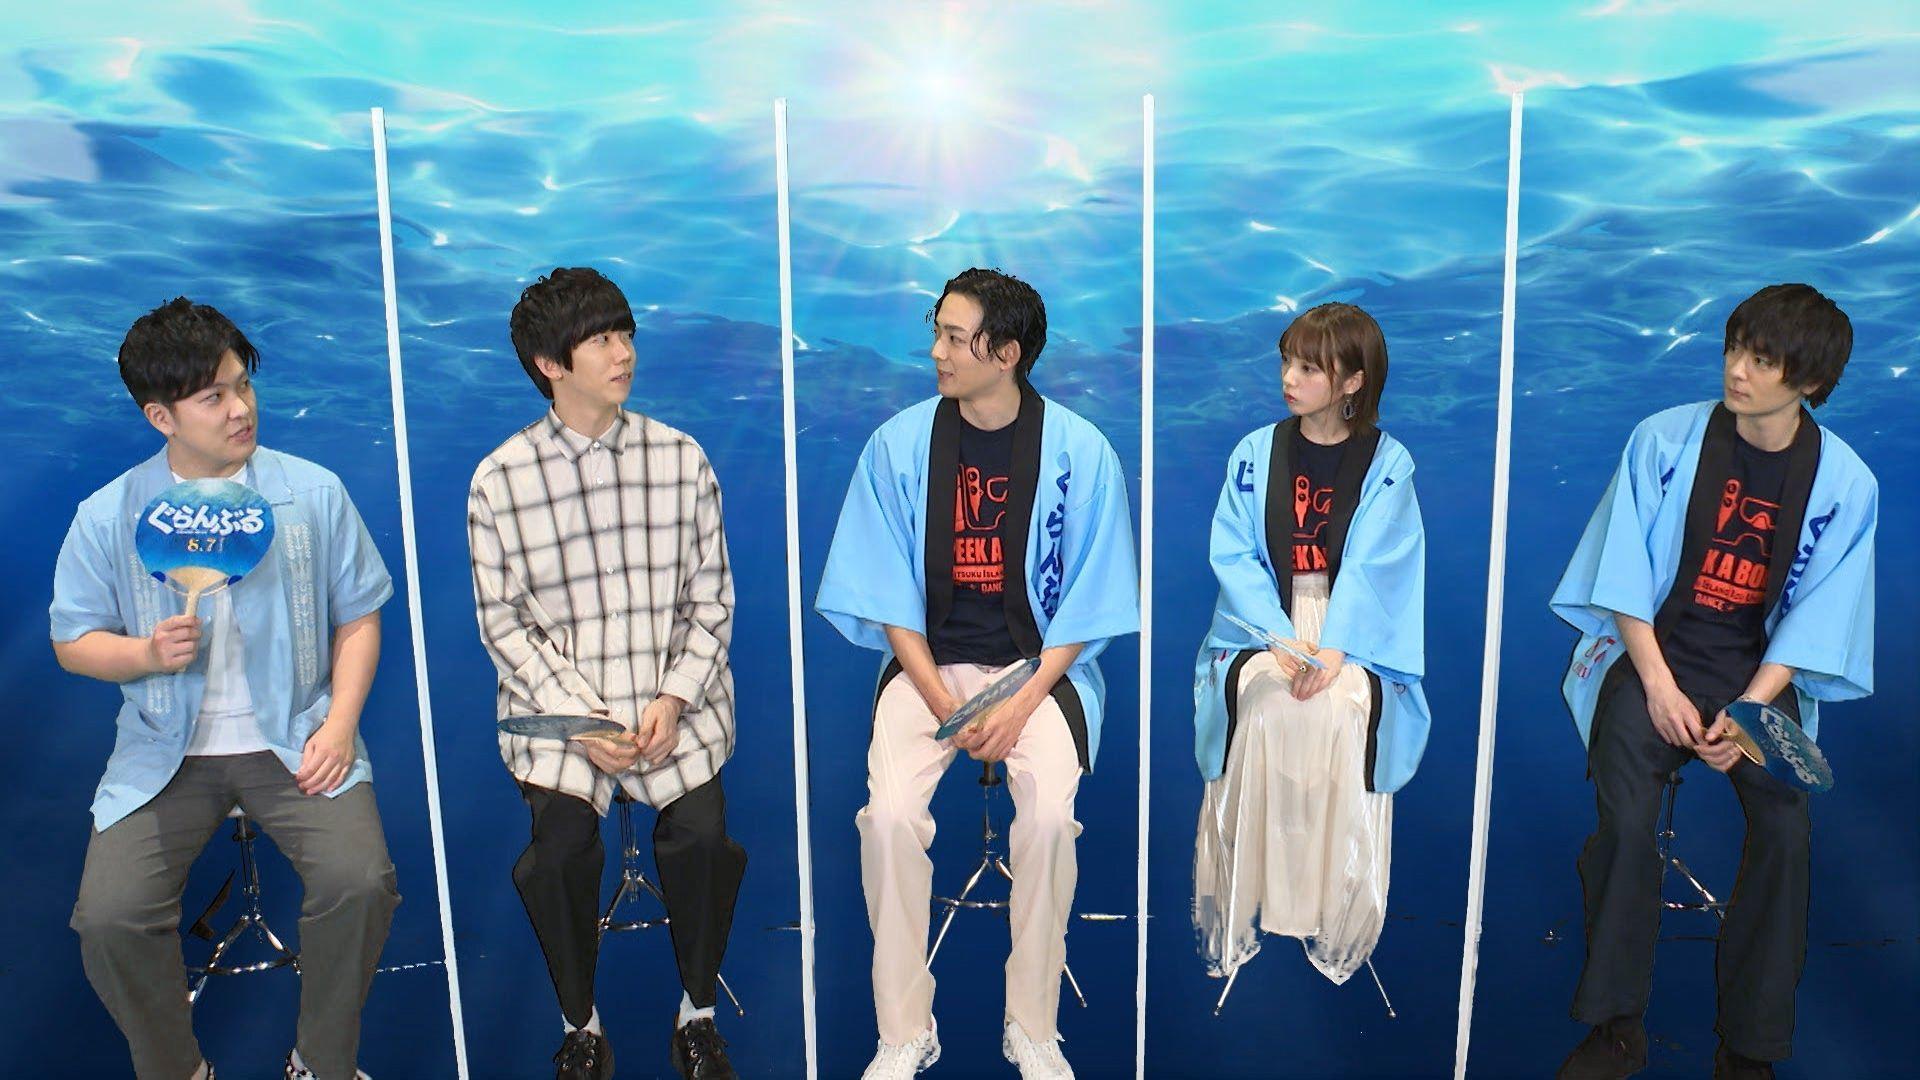 左から、sumika小川貴之・片岡健太、竜星涼、乃木坂46与田祐希、犬飼貴丈